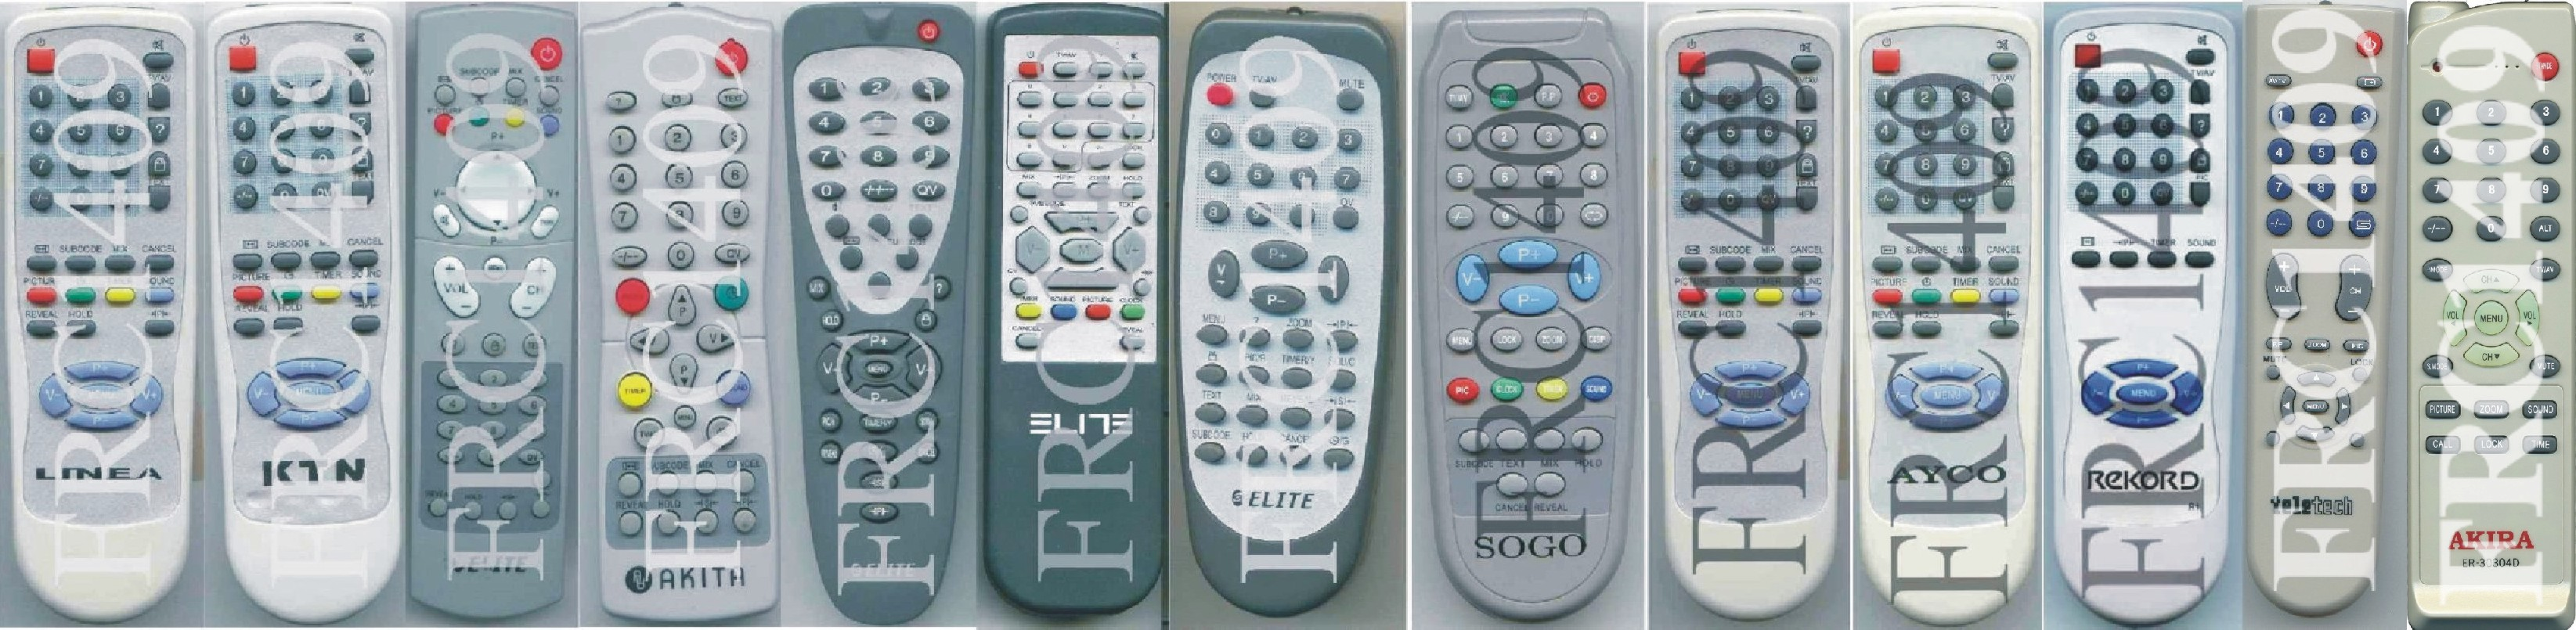 Инструкция к телевизору schneider stv 750